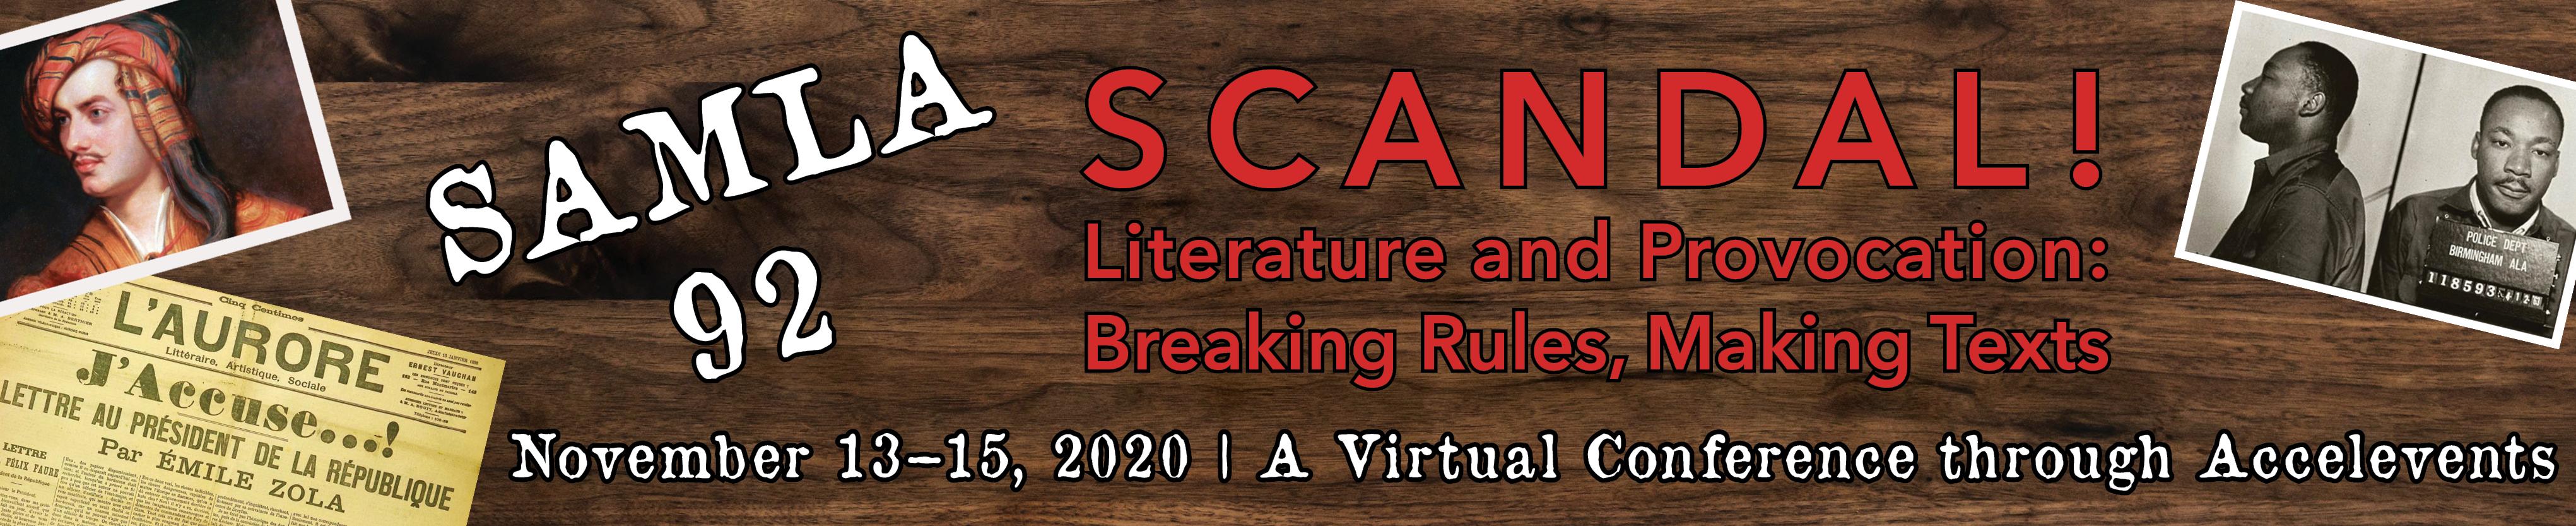 SAMLA 92 | Jacksonville, FL | 13-15 Nov 2020